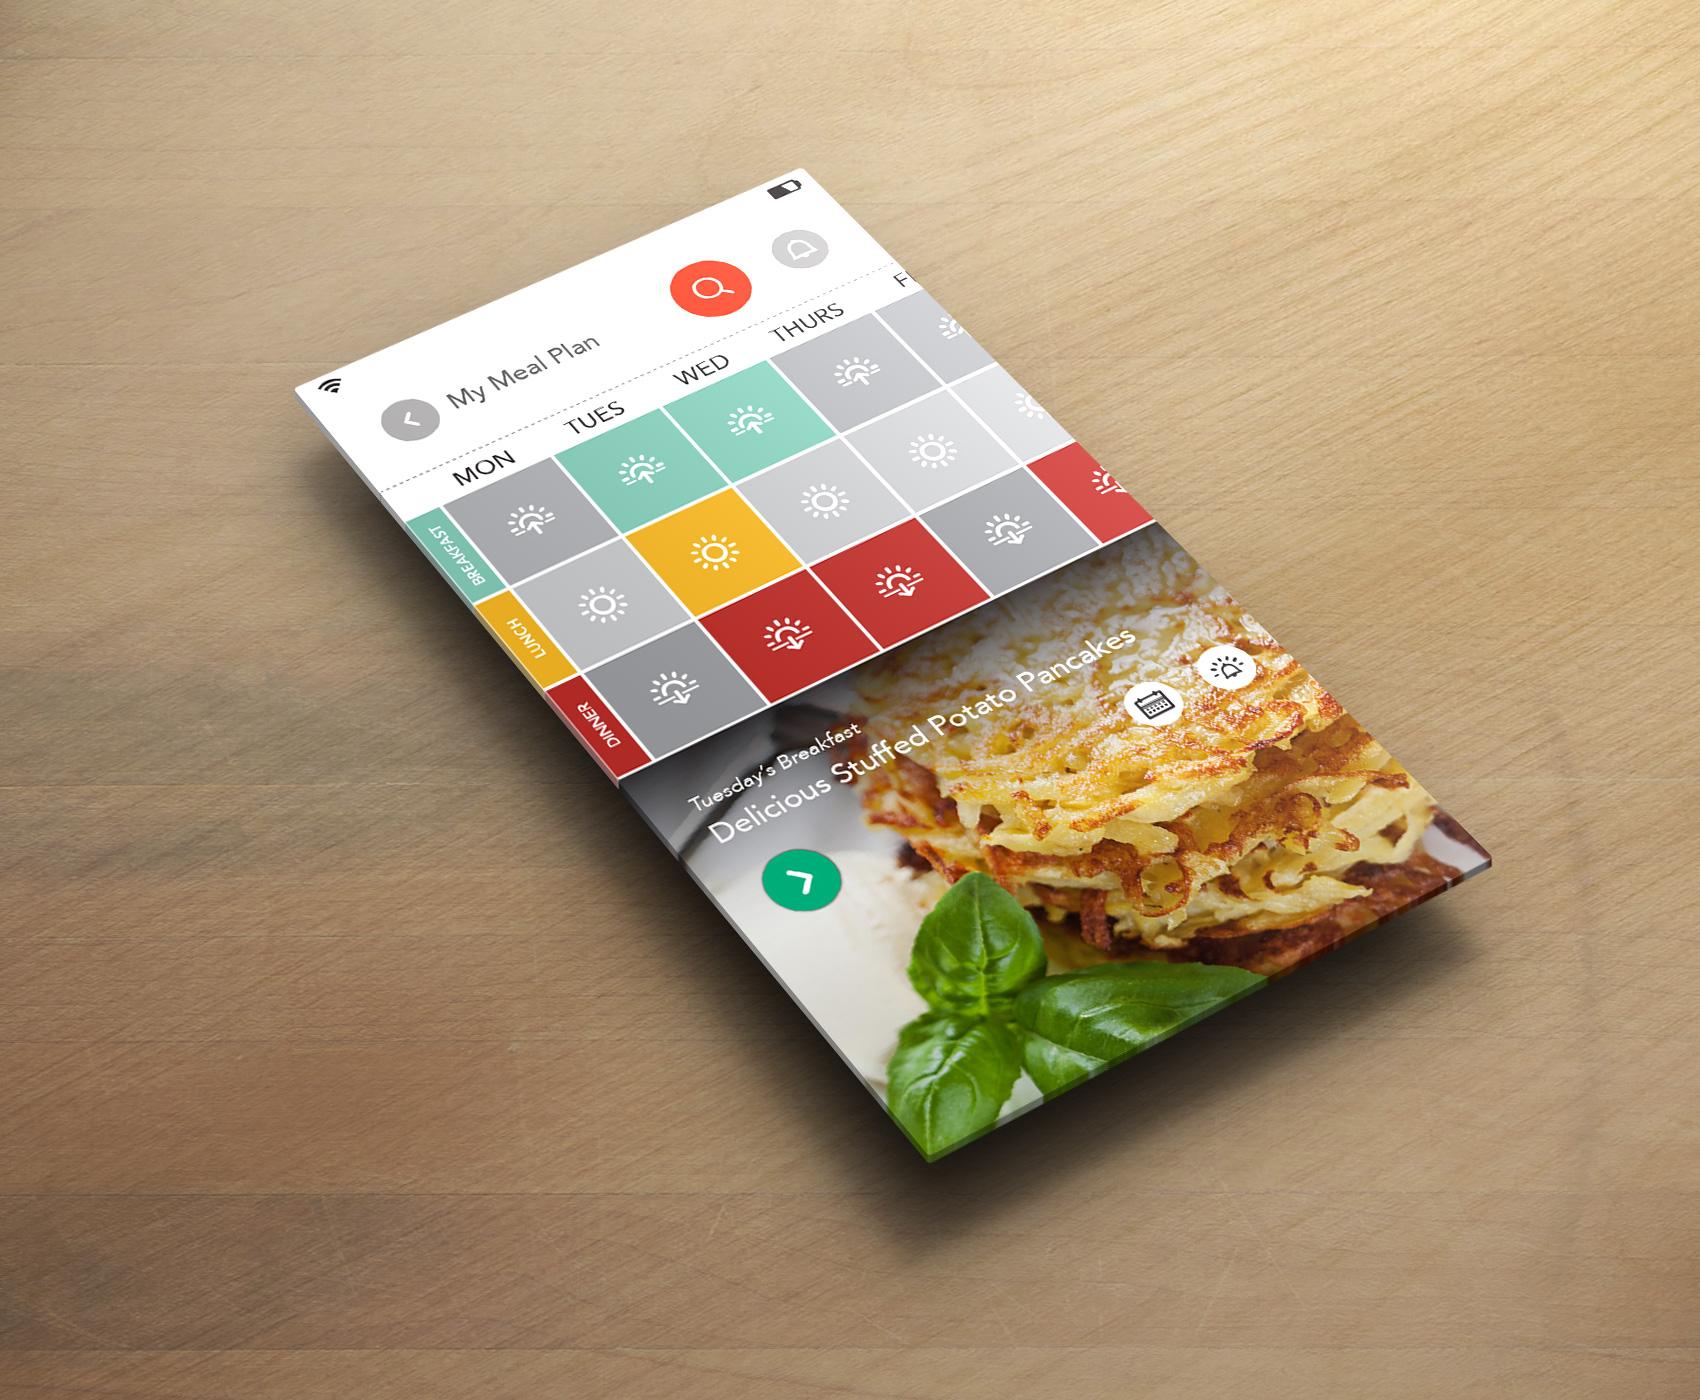 05_2014-05-29--My-Meal-Plan_CR_03-10.jpg